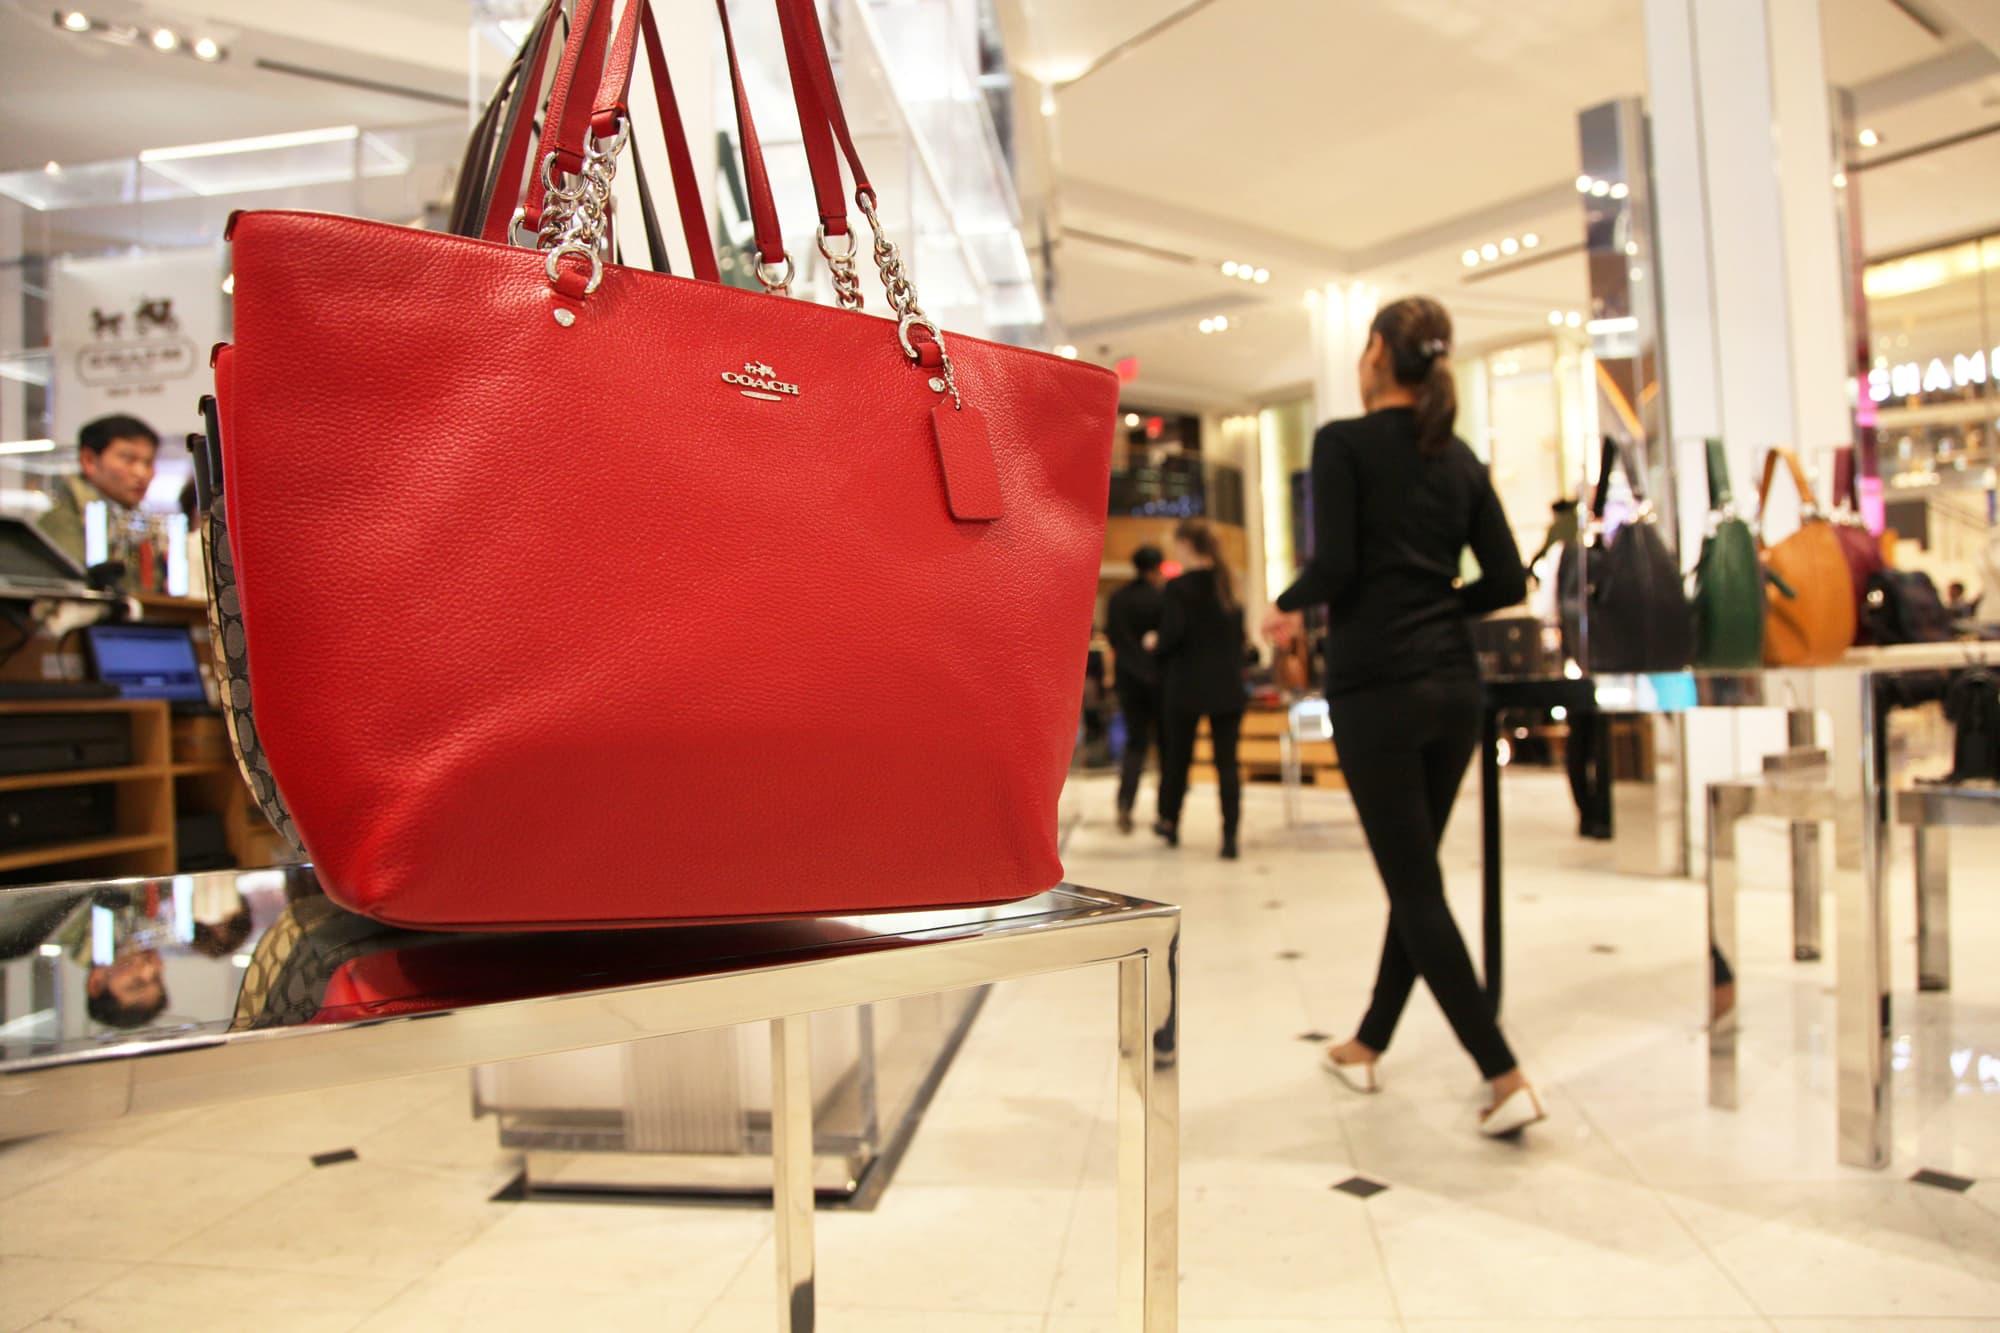 discount coach handbags outlet og9t  discount coach handbags outlet